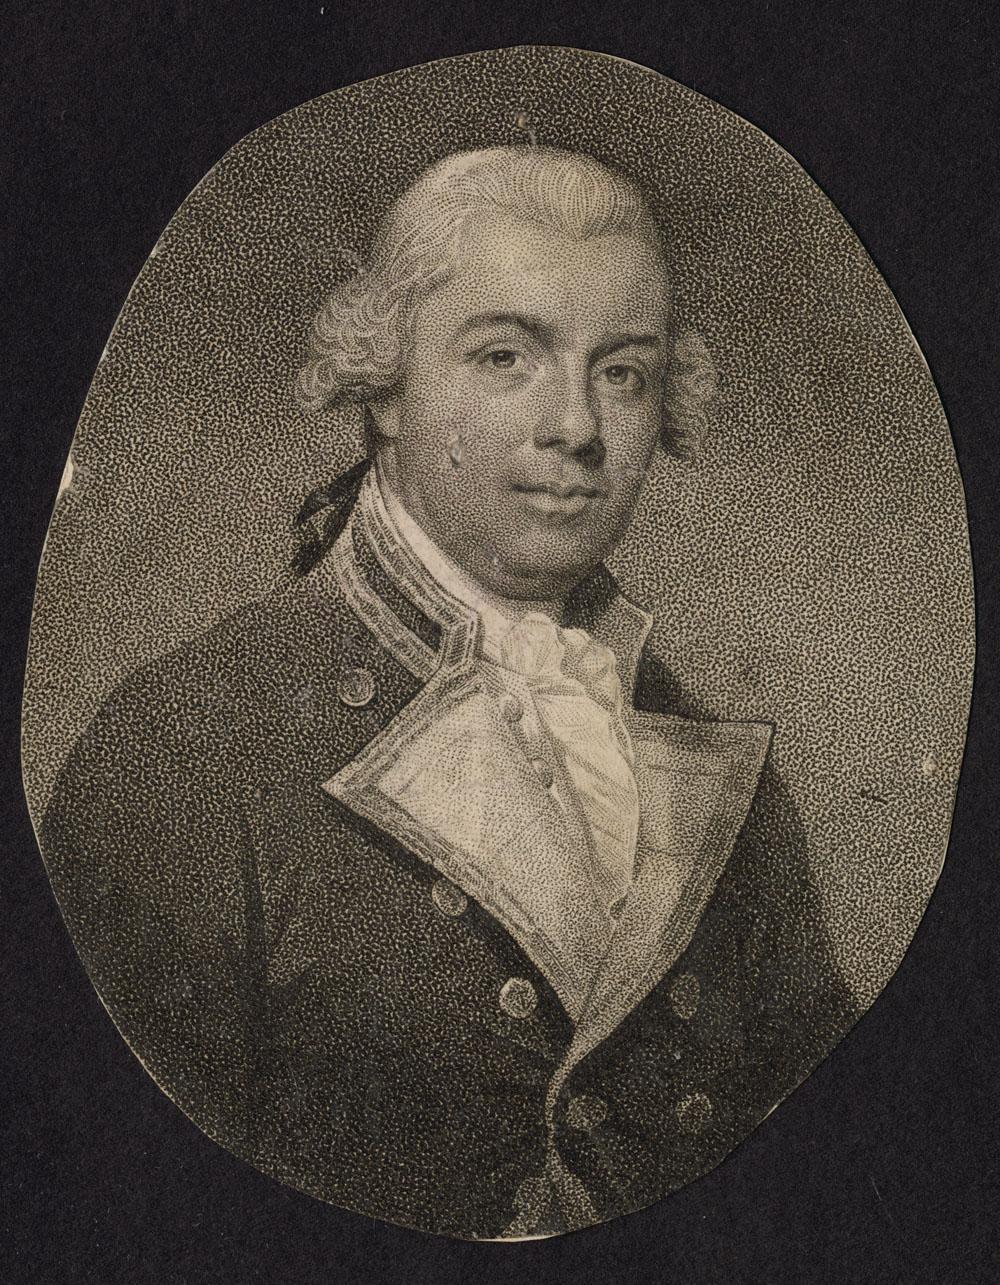 1726 in Canada